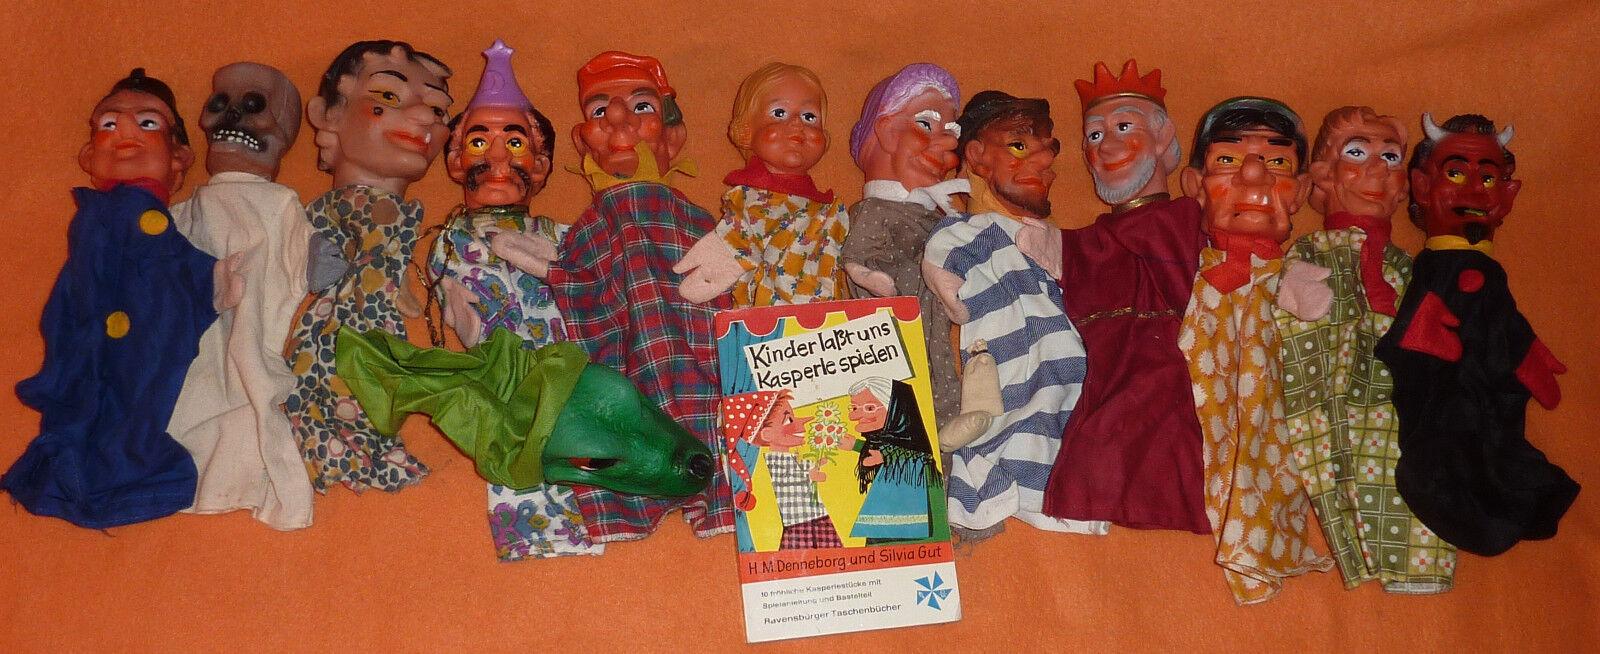 Kasperle Puppen Sammlung 13 Handpuppen Teufel Zauberer Gespenst König Dieb etc.